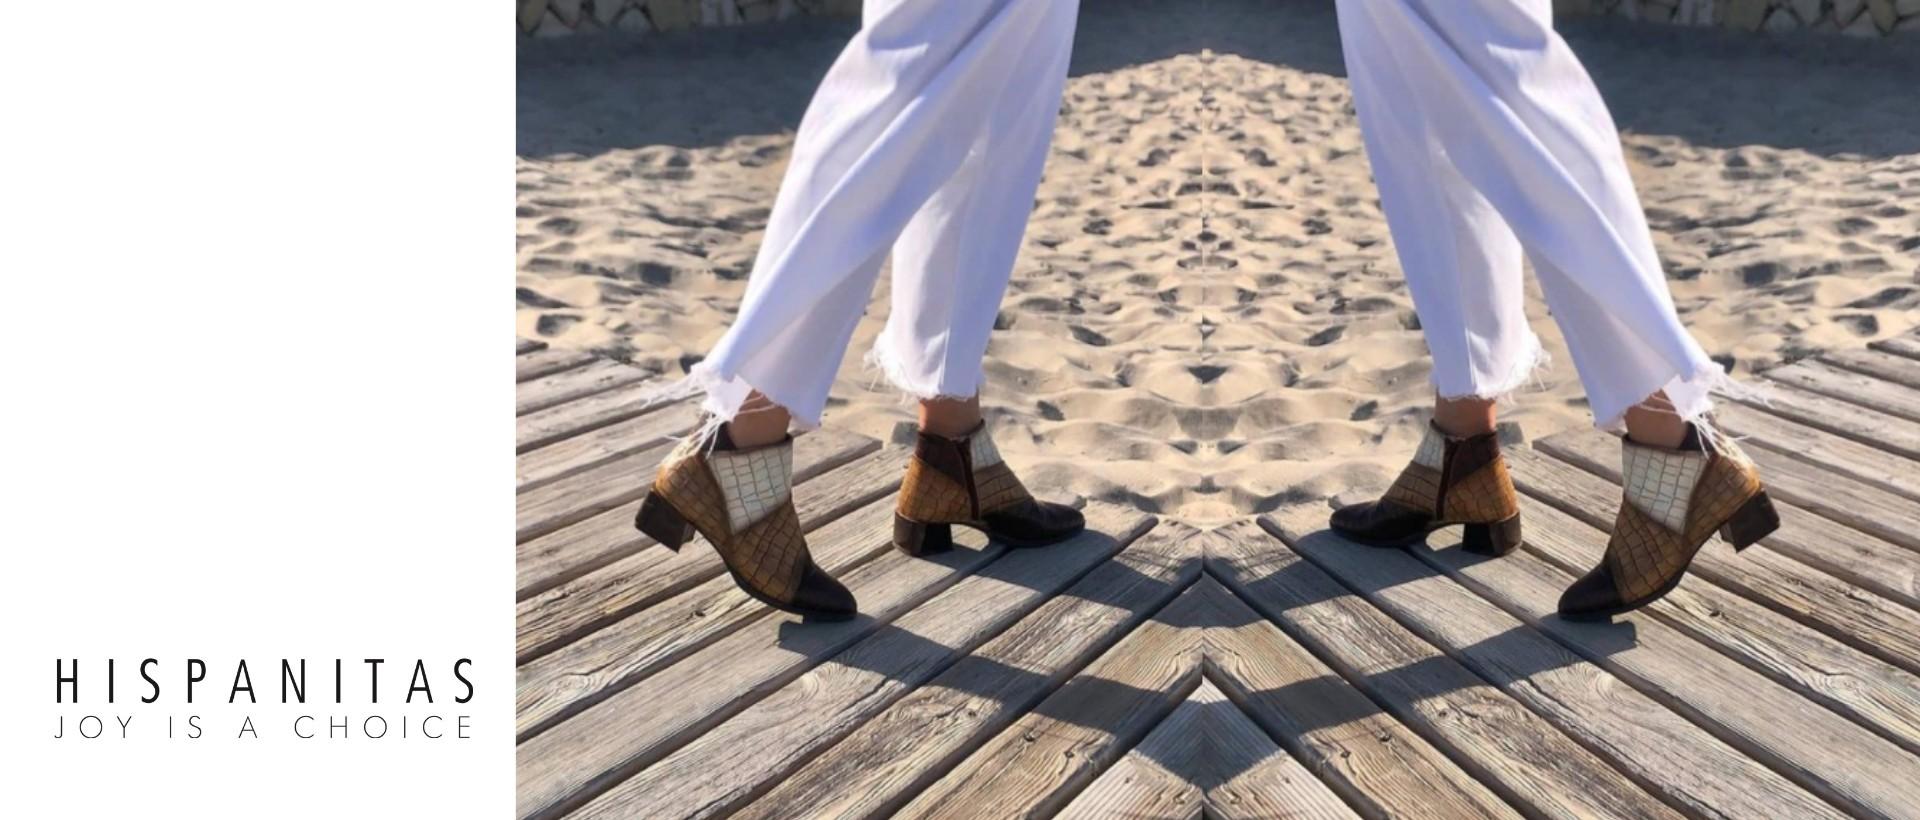 Hisoanitas mulher | Botas mulher Hispanitas | Calçado Espanhol Mulher